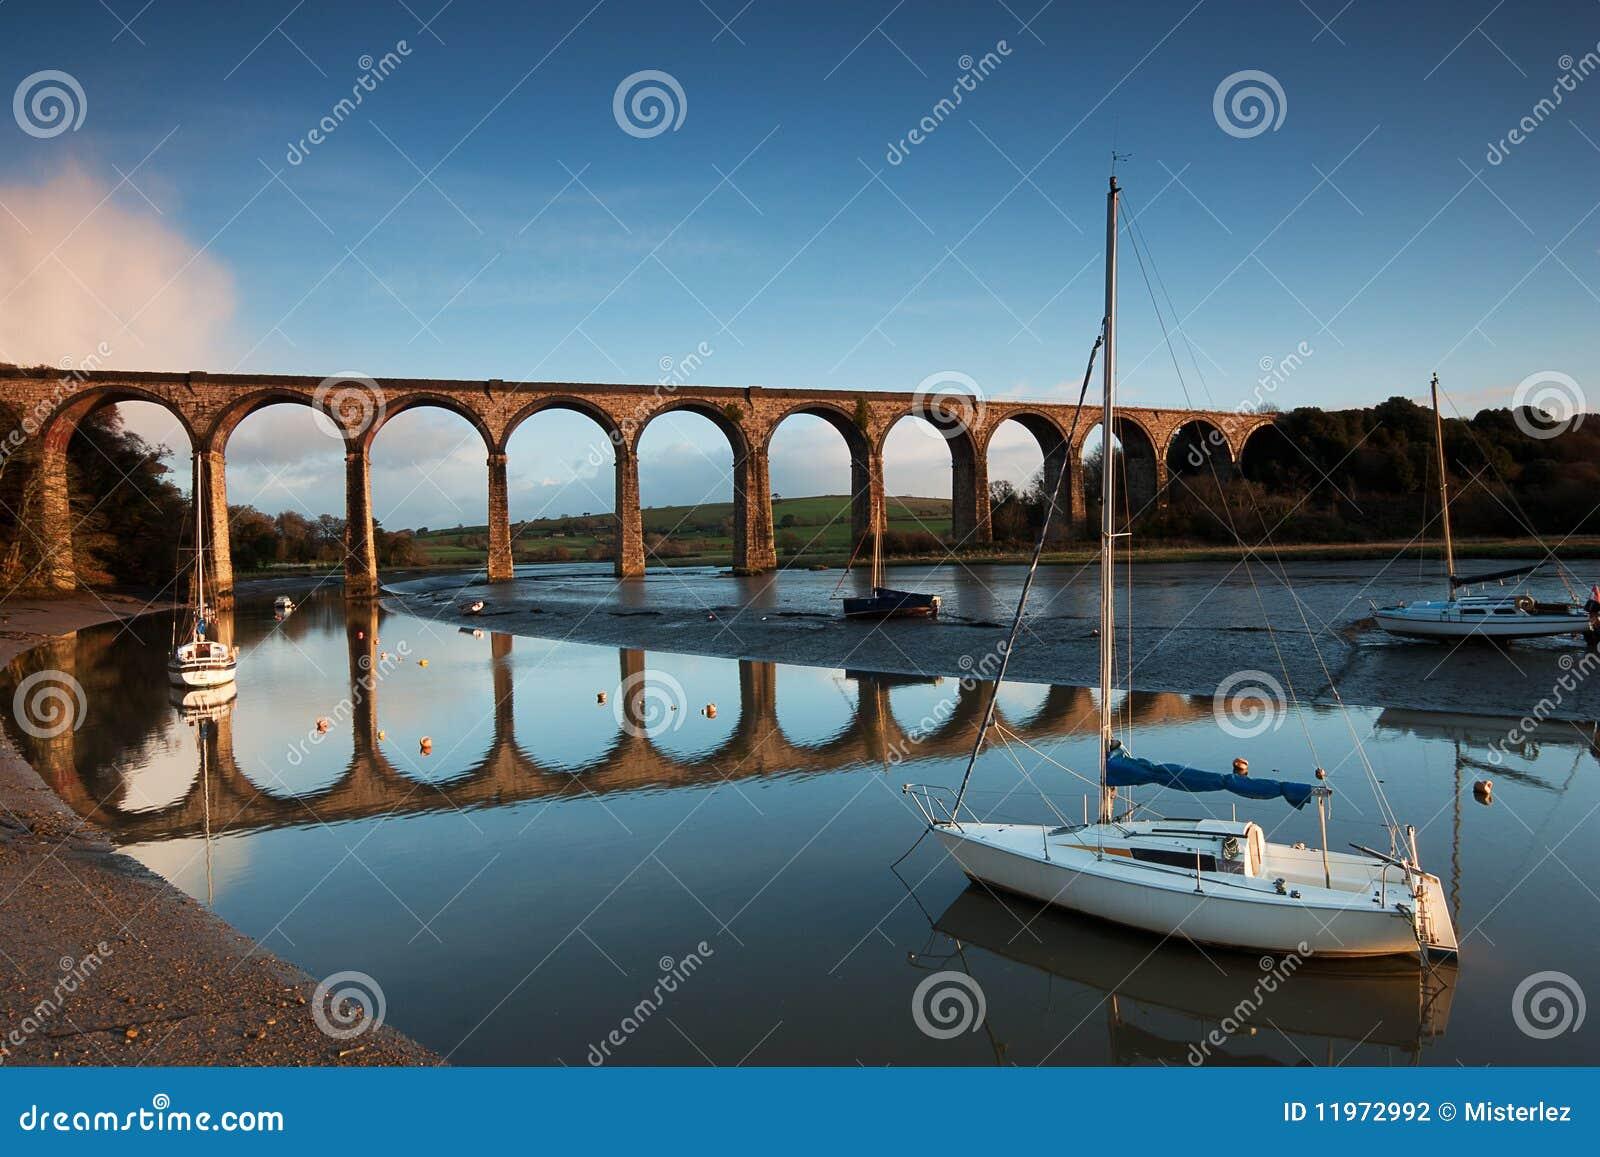 St.Germans Viaduct